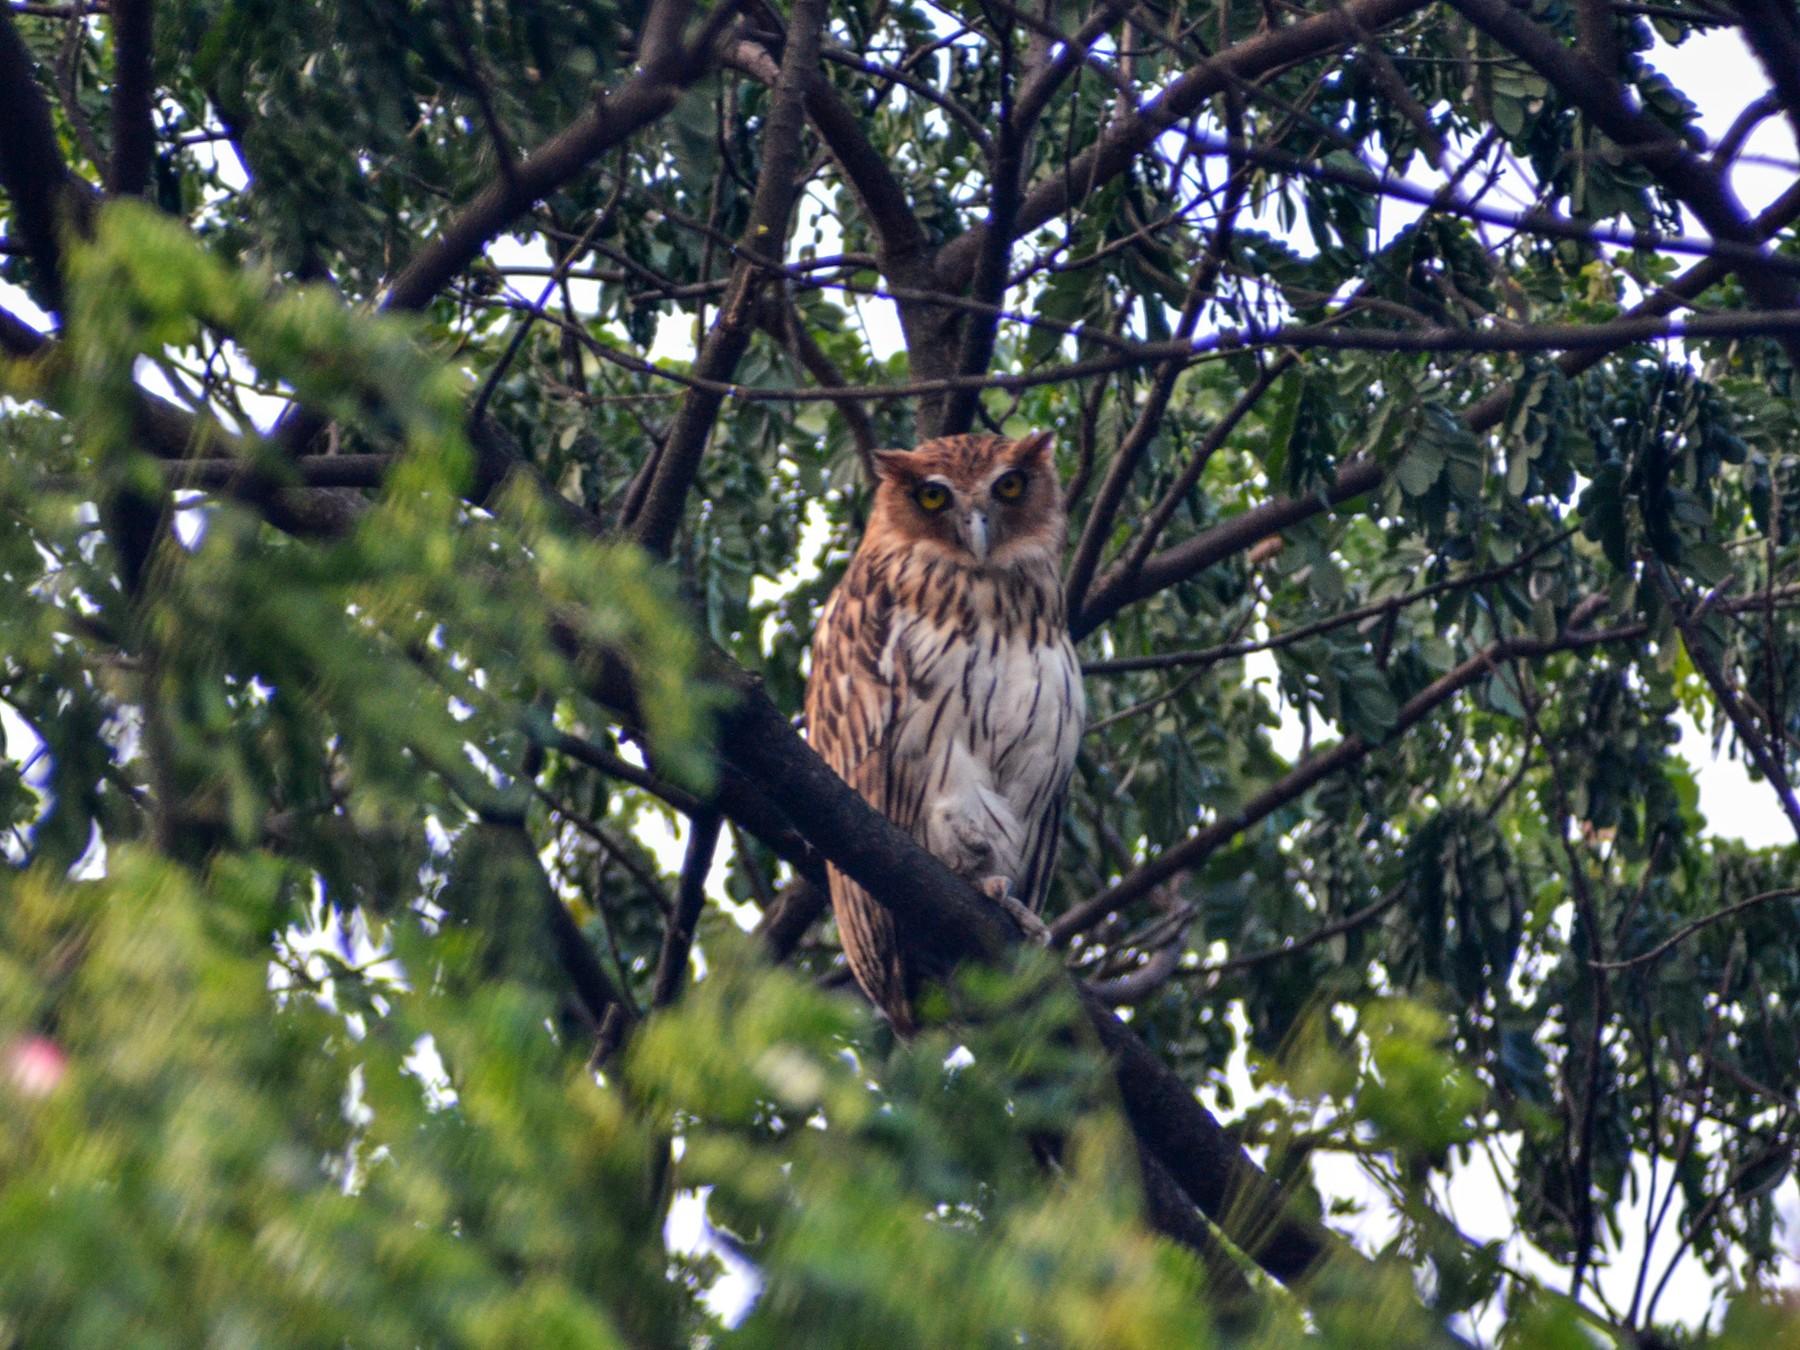 Philippine Eagle-Owl - Jose Antonio (JJ) Sta Ana